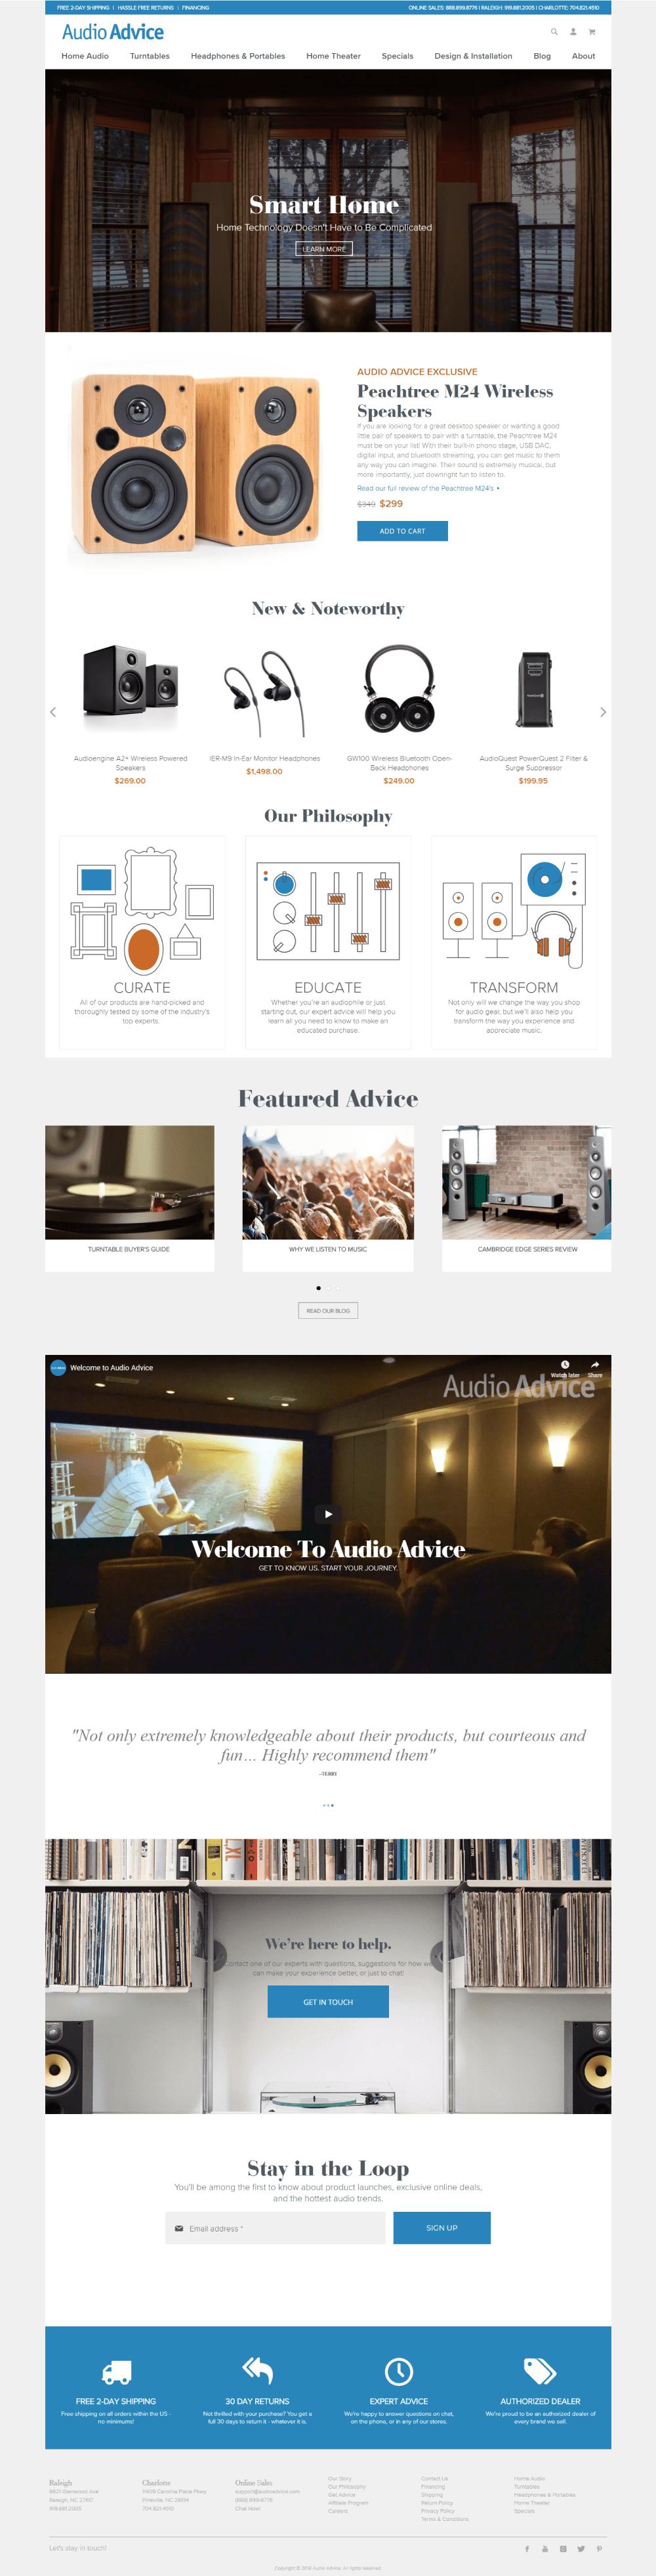 Websites using Pearl Theme Magento 2